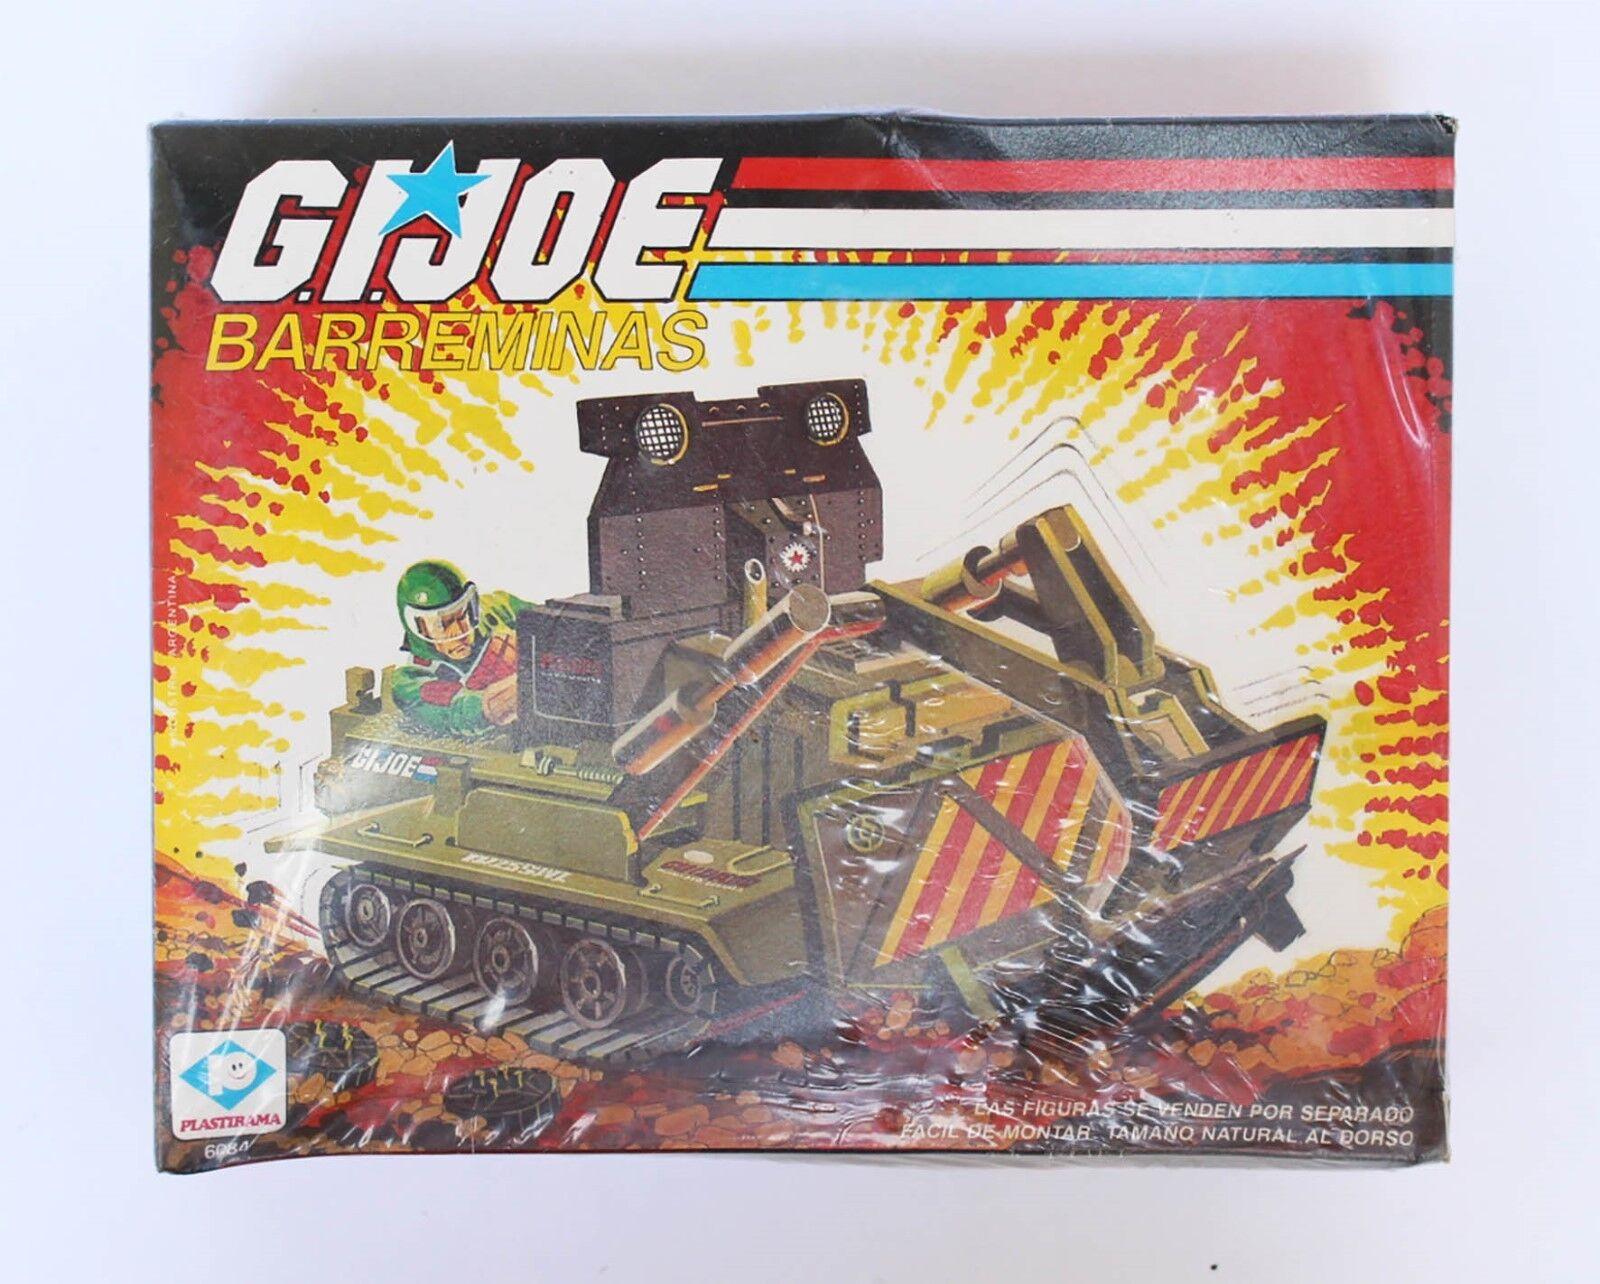 GI Joe Vintage Bomb Disposal MISB Plastirama  argentooina  in vendita scontato del 70%